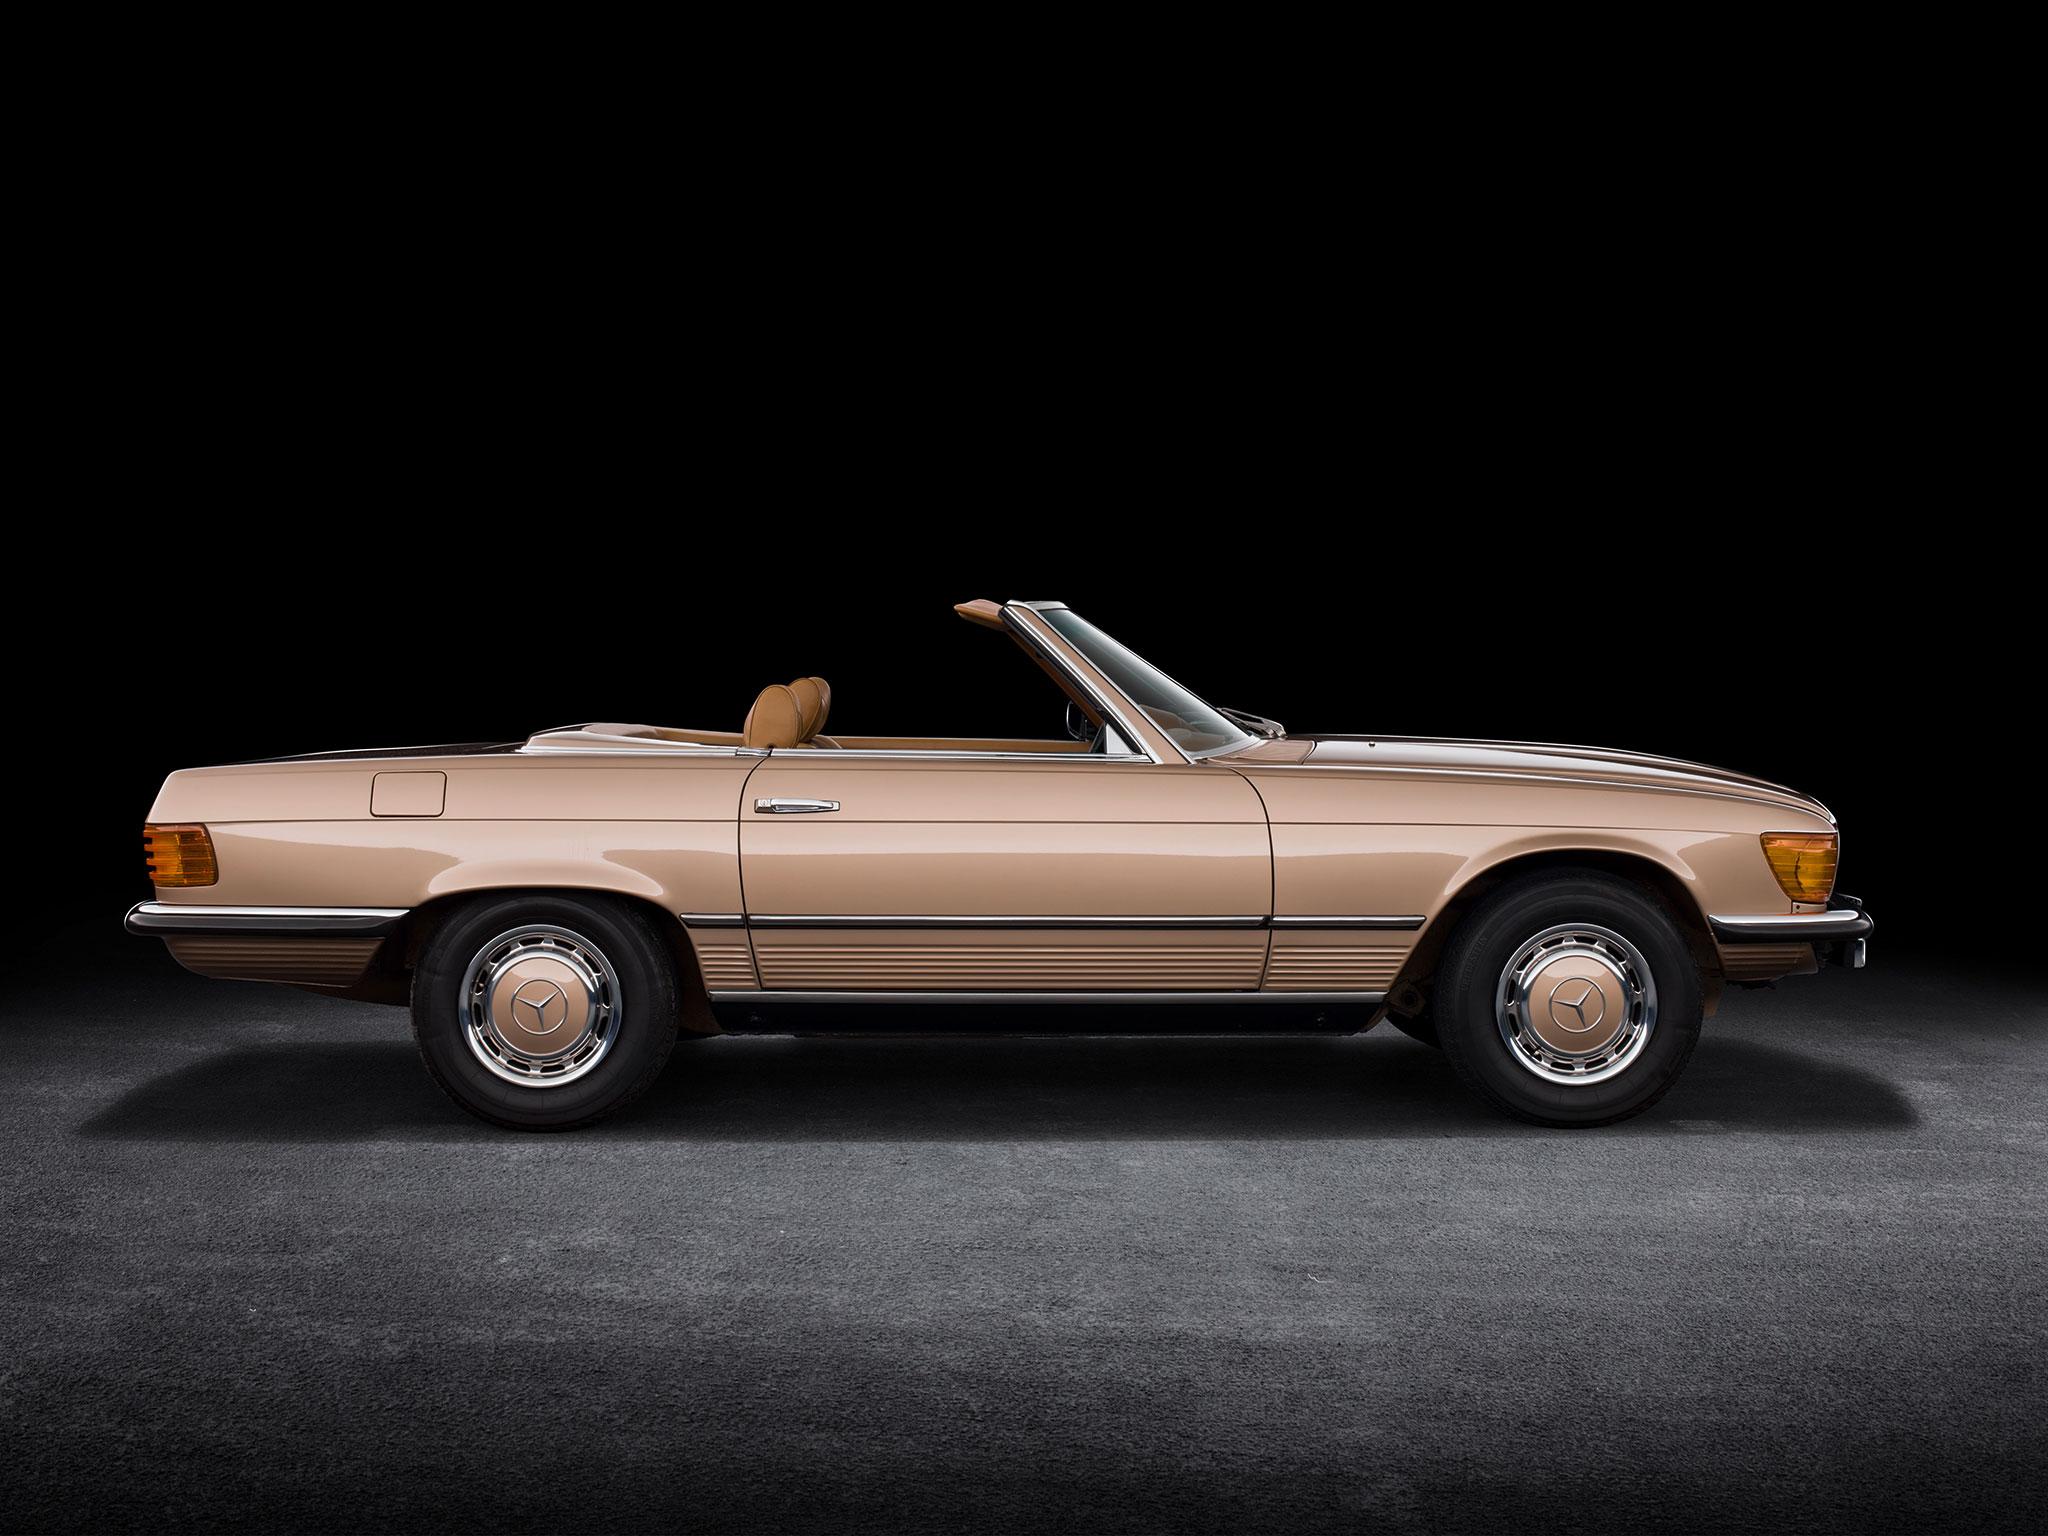 1971-1989 1980 Mercedes-Benz 350 SL R 107 ligne intemporelle signée Friedrich Geiger.